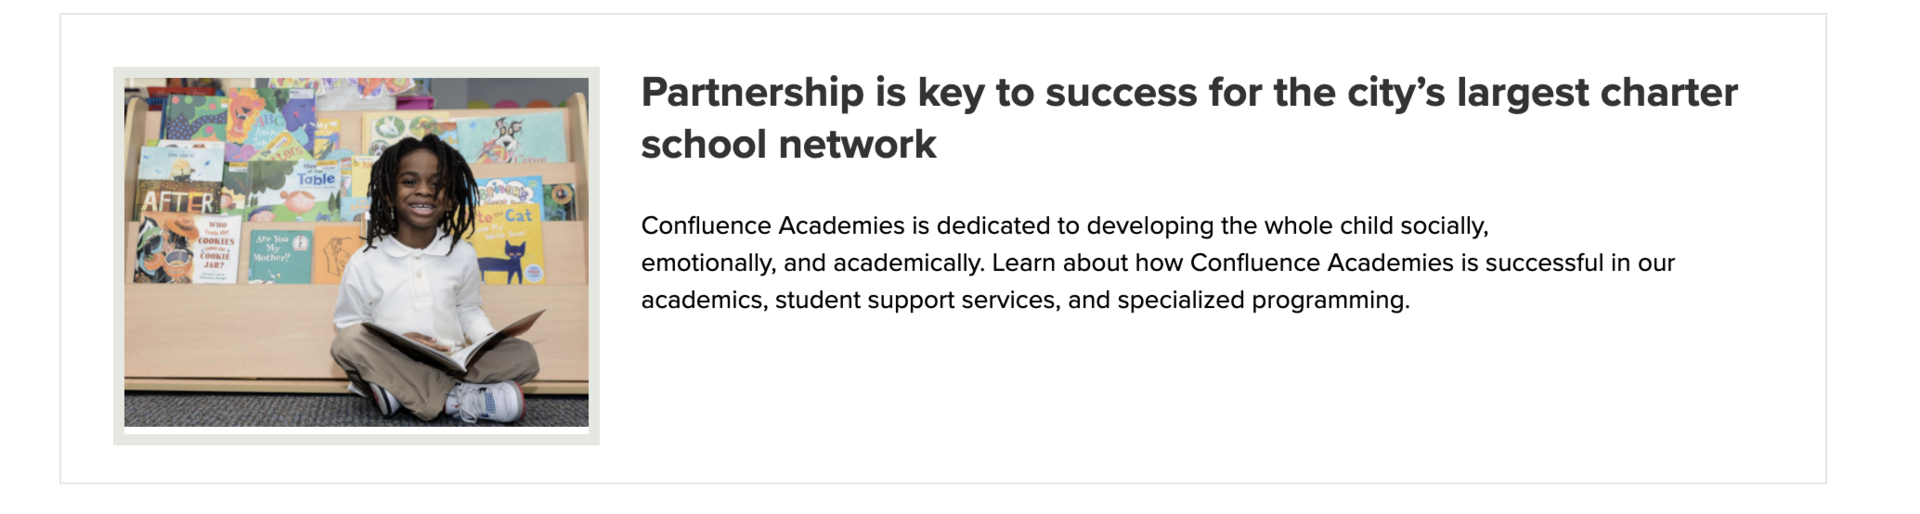 confluence academies partnership success